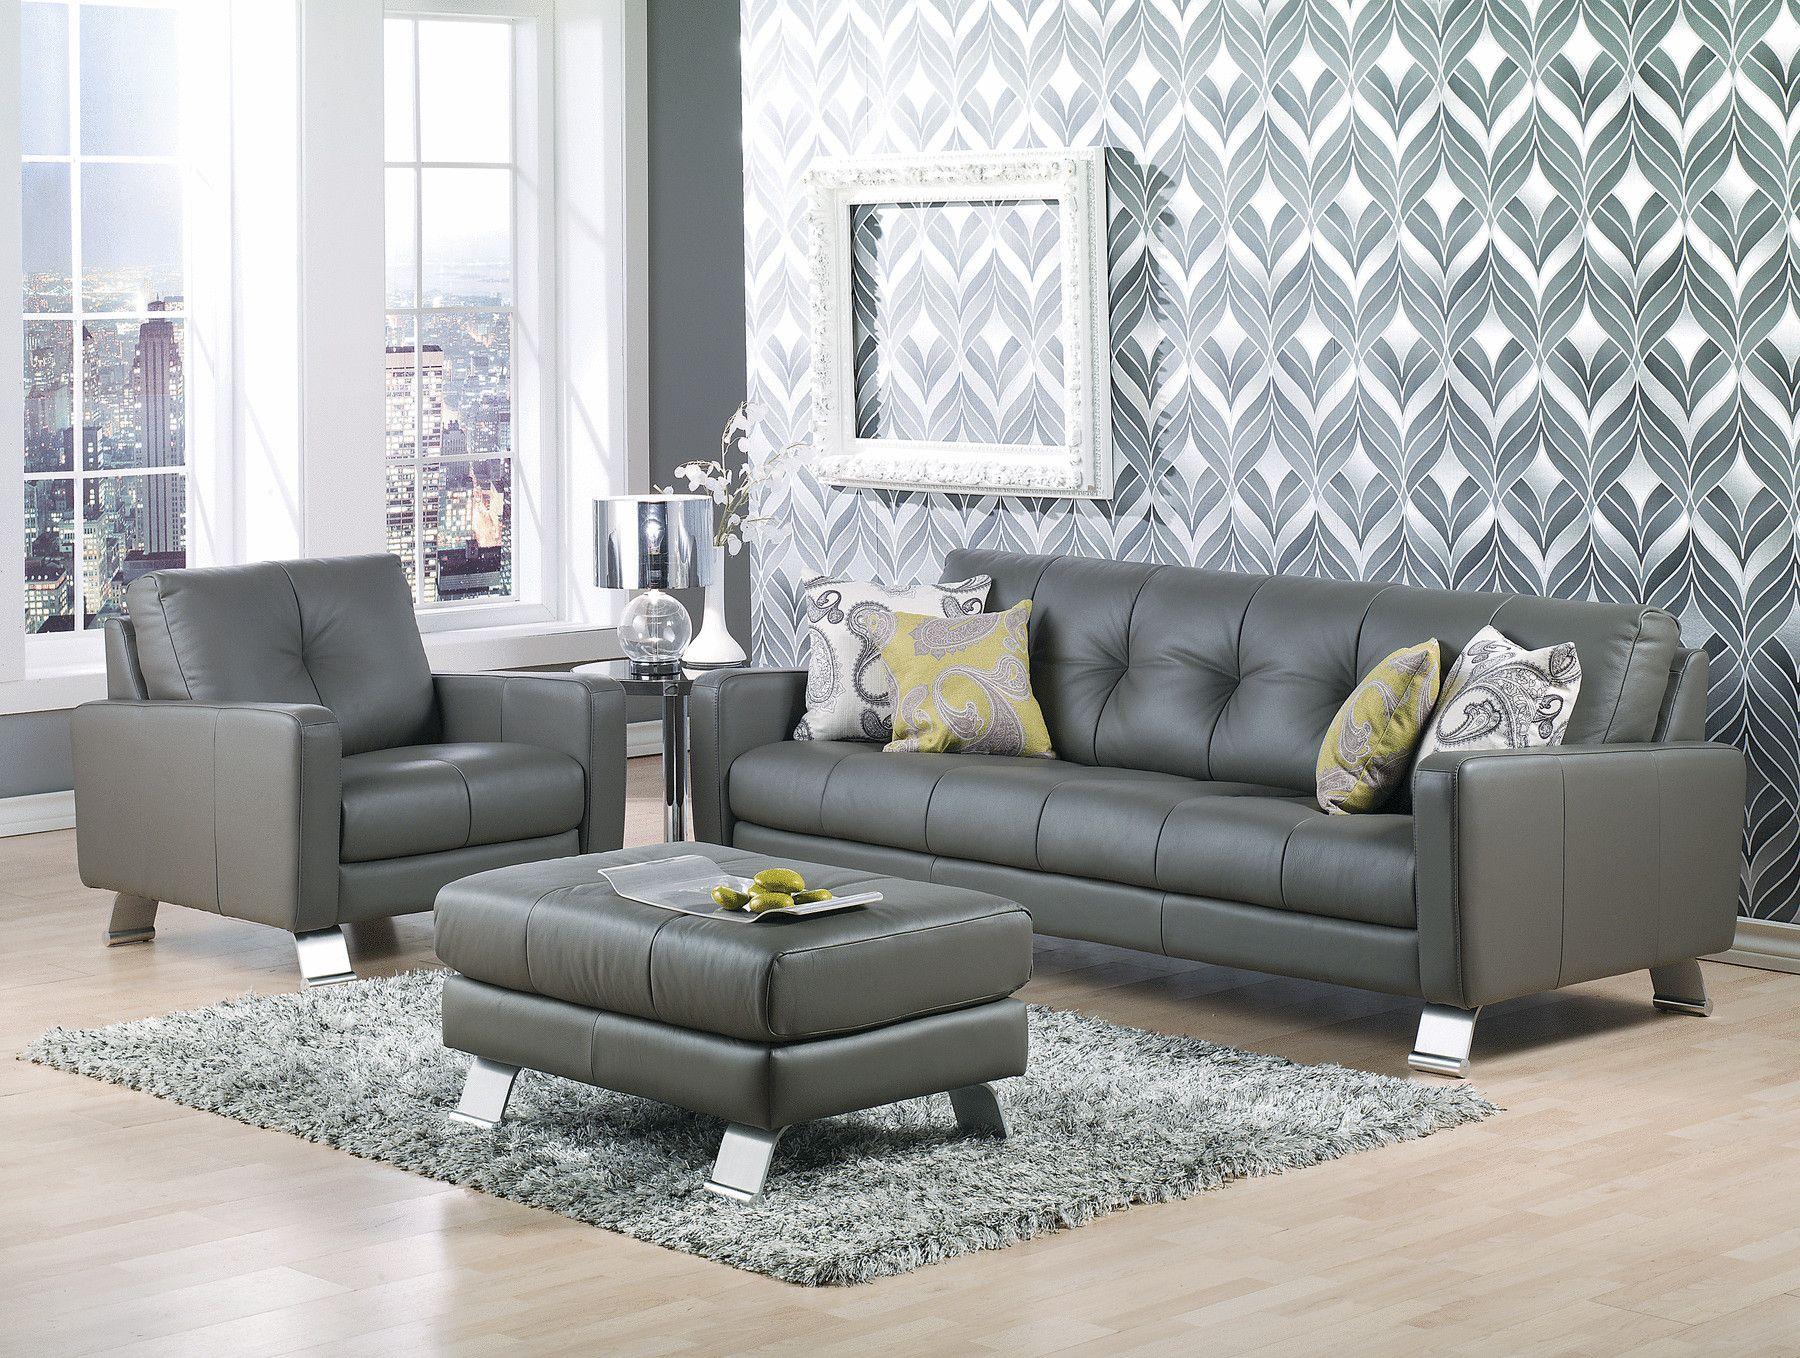 Palliser Ocean Drive Sofa, Chair & Ottoman nearly 100